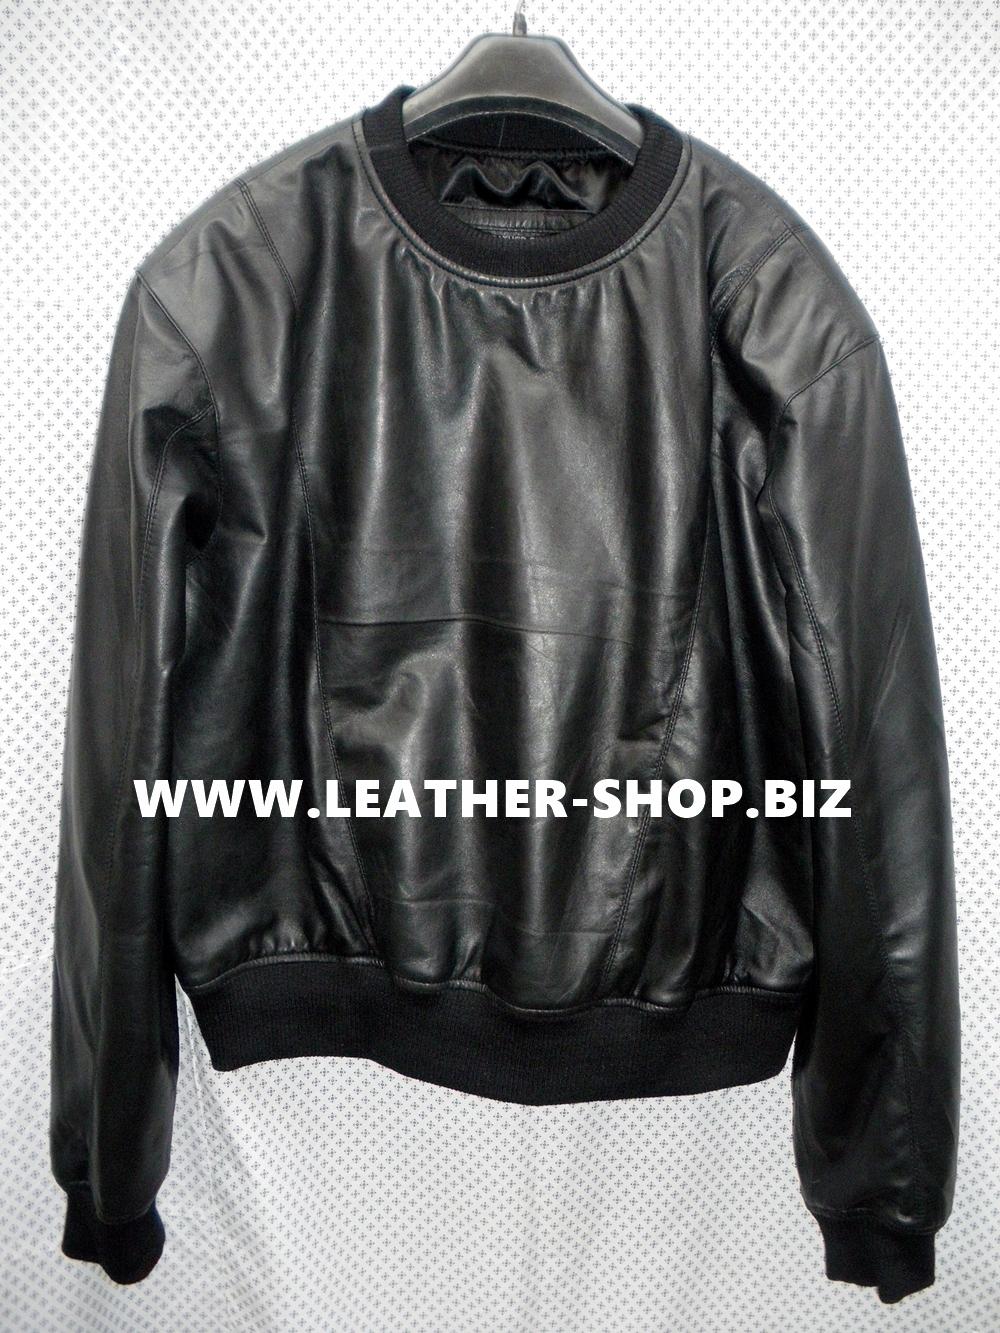 lambskin-leather-sweat-shirt-custom-made-style-lss005-www.leather-shop.biz-front.jpg